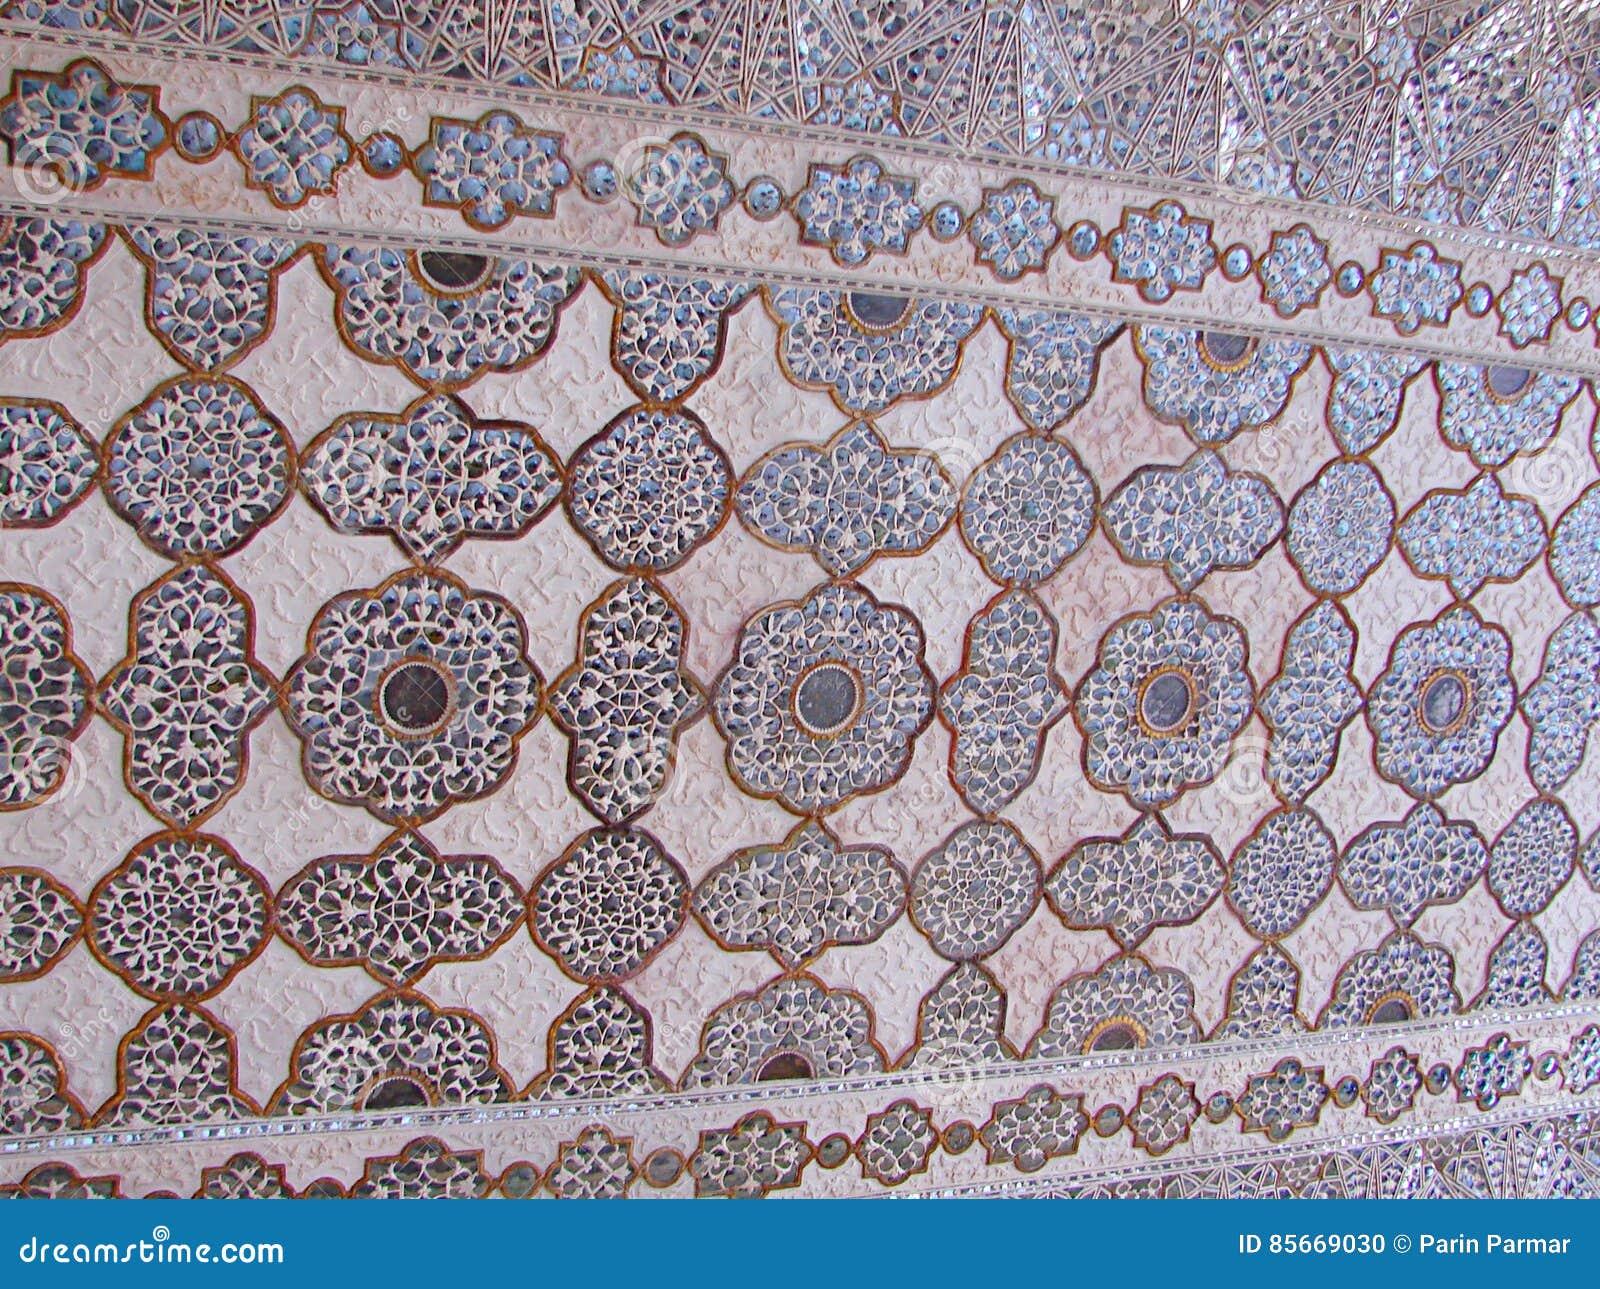 Een Gesierd Plafond in Spiegelpaleis, Amer Palace, Jaipur, Rajasthan, India